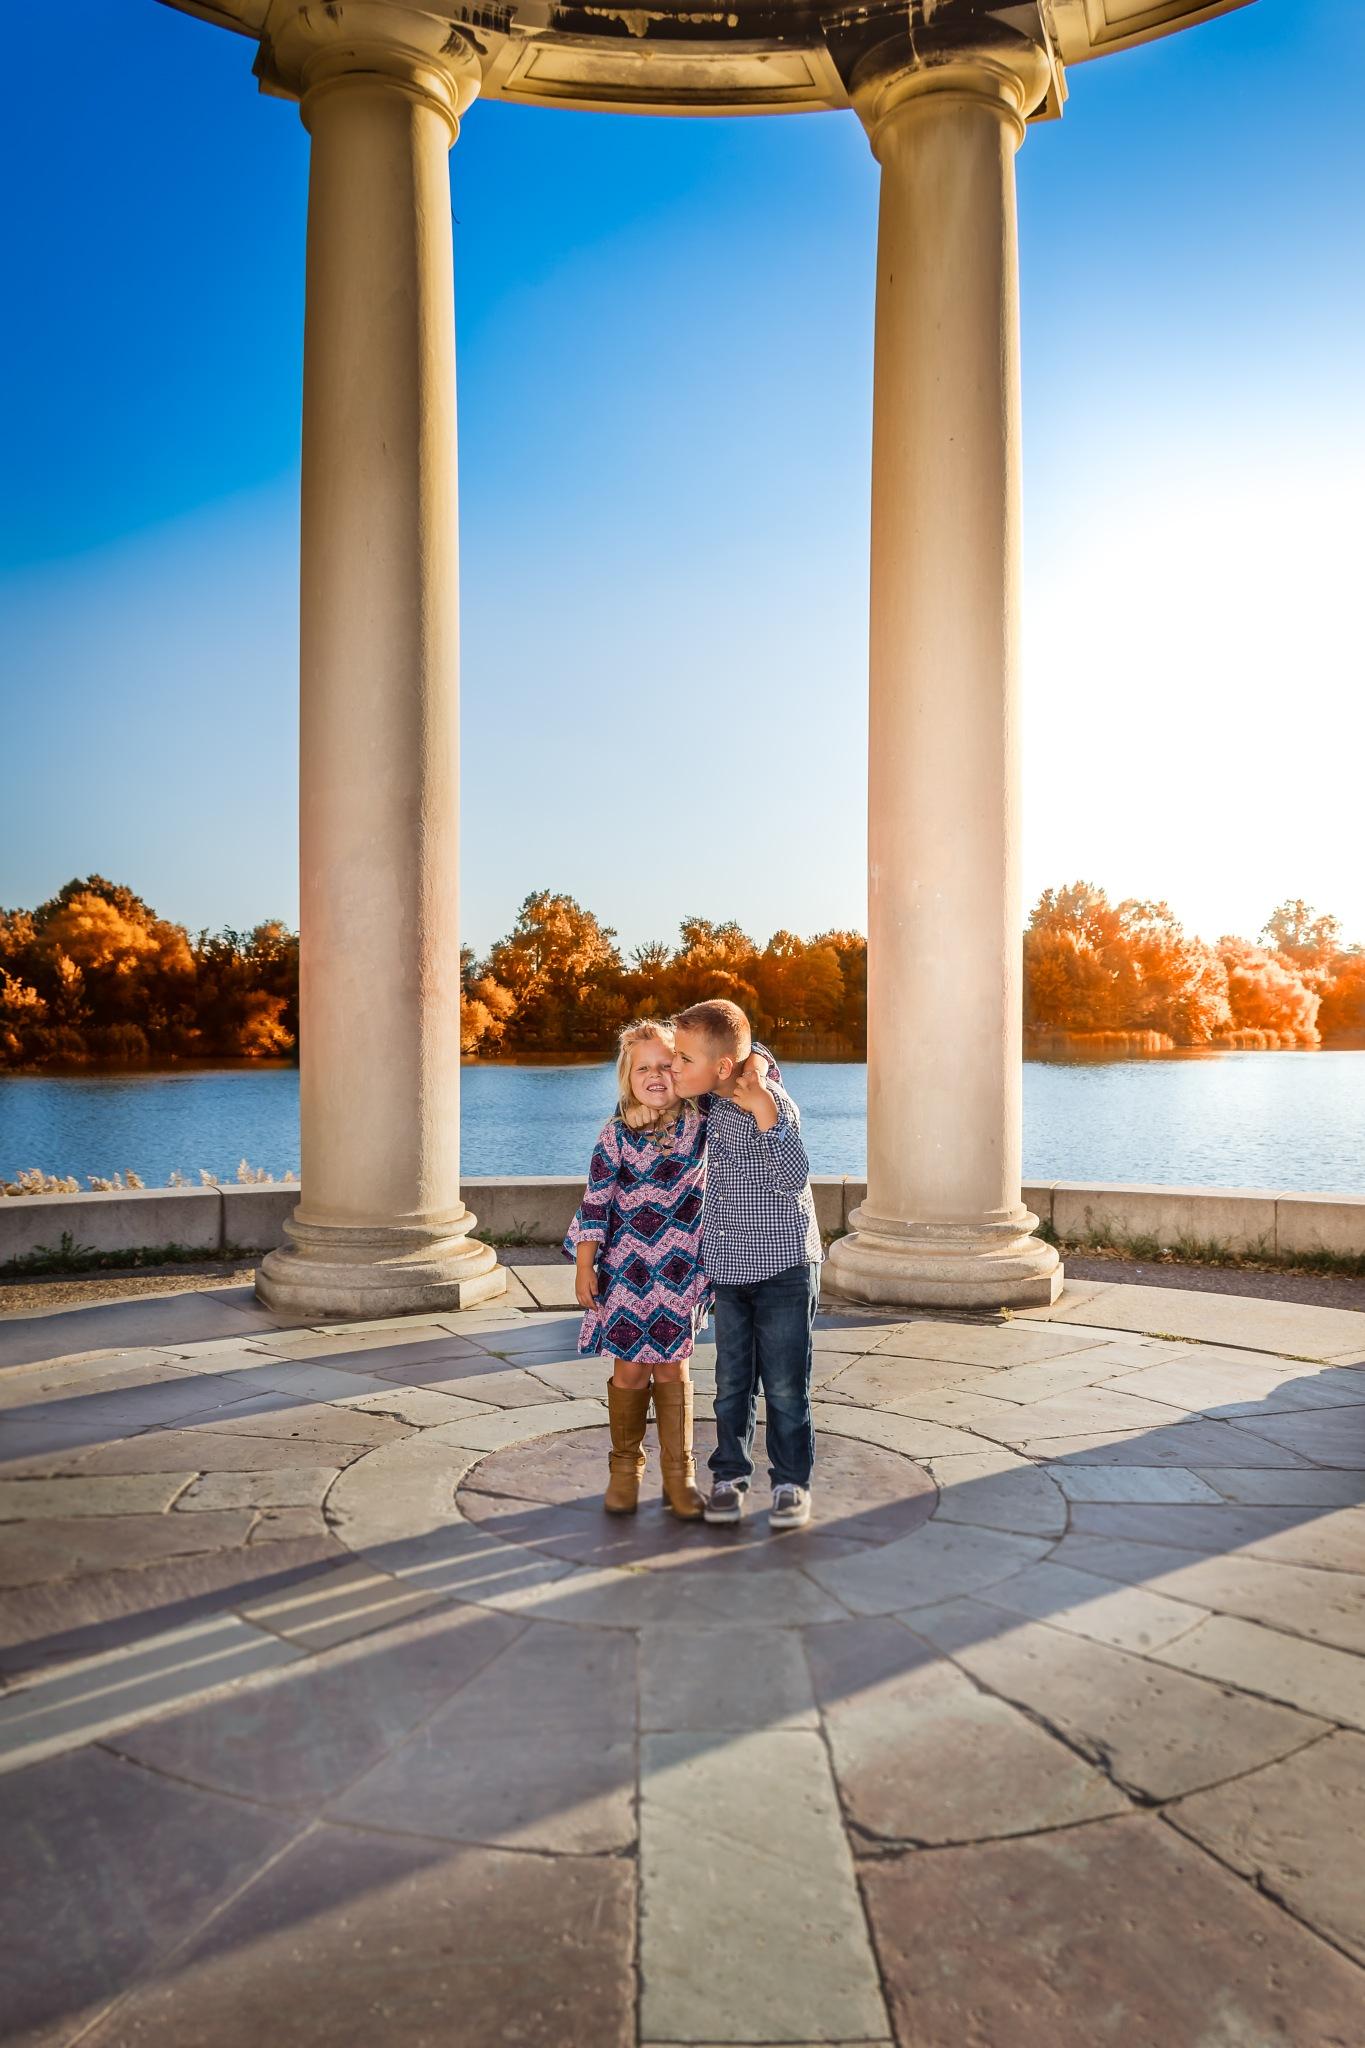 autumn kiss by Carina McKee